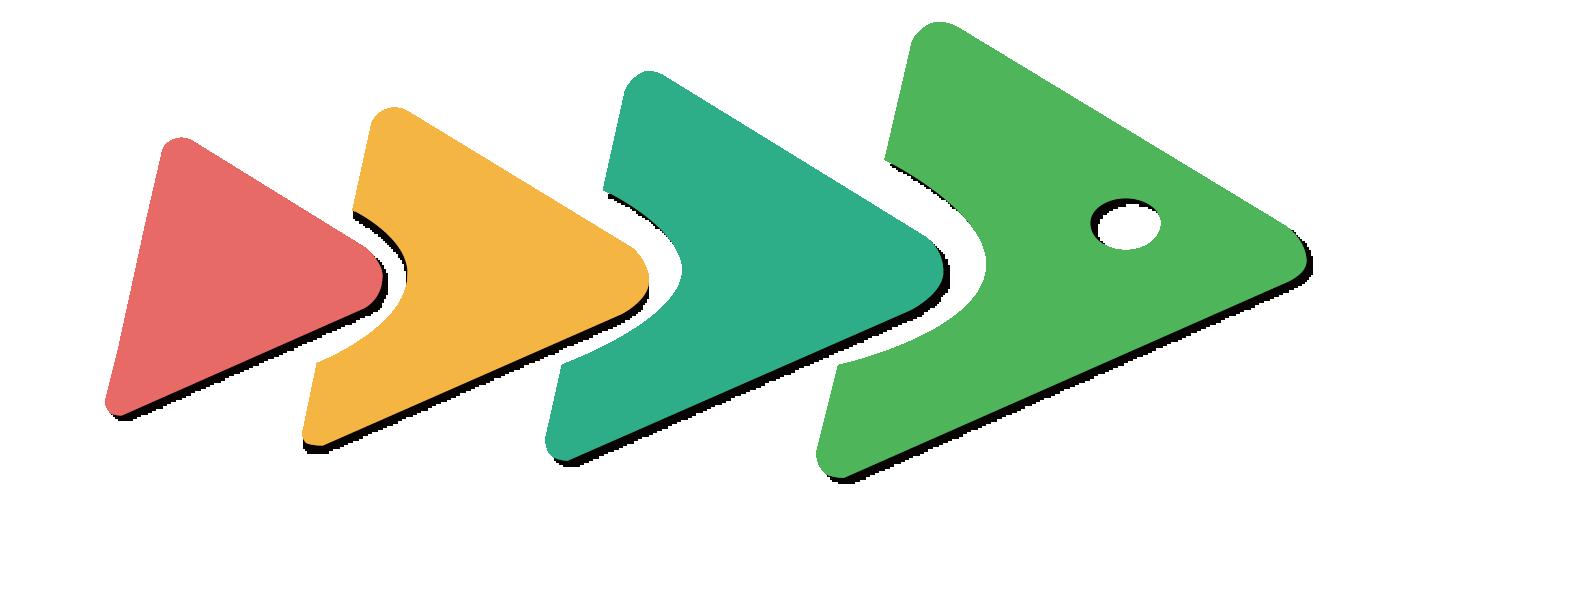 Triangular clipart rgb. Color model computer software